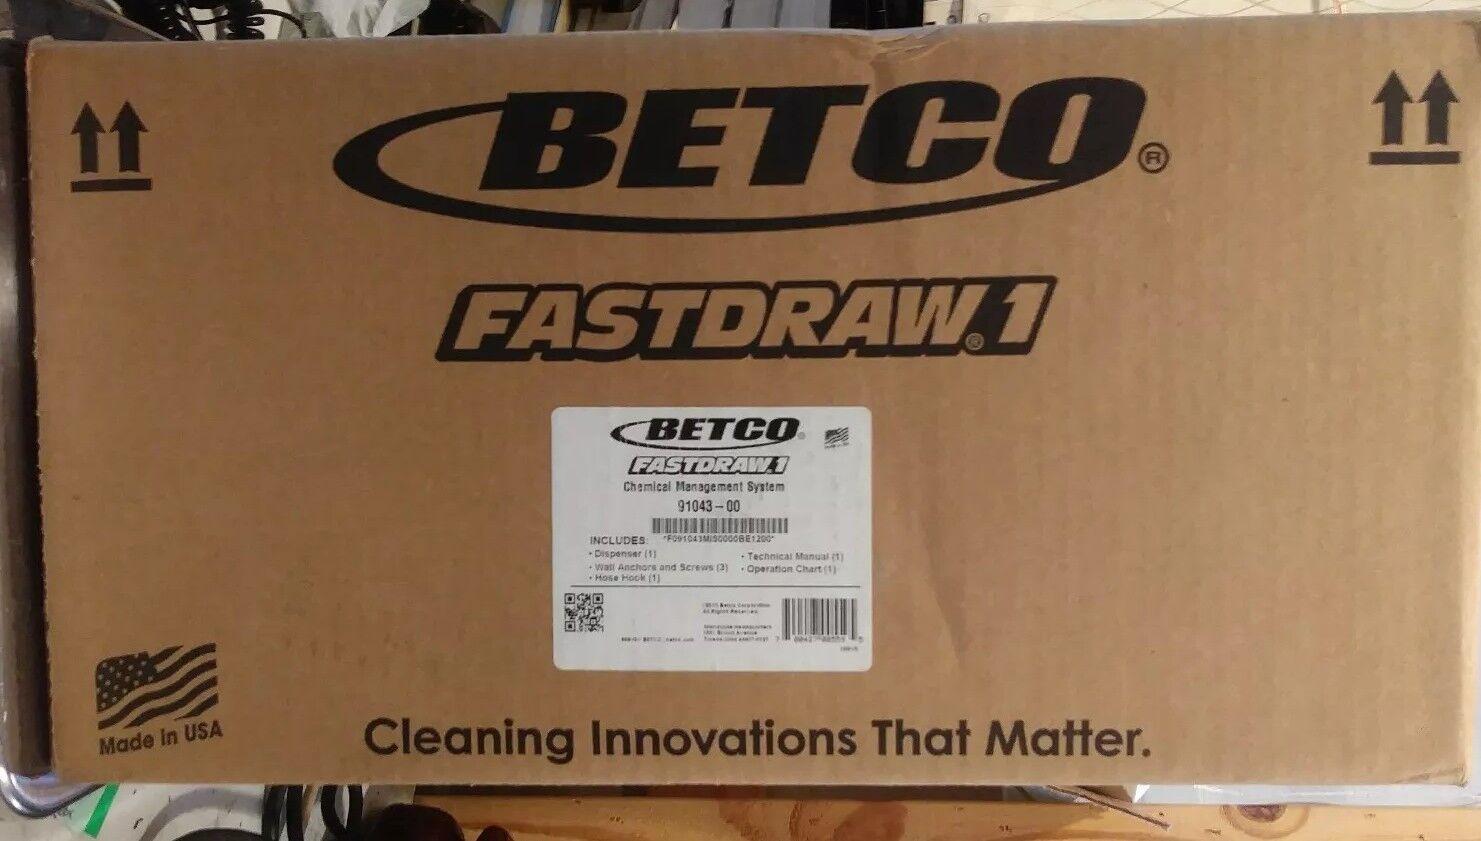 Betco Fastdraw 1 Chemical Management Dispenser - 91043-00 Fastdraw1